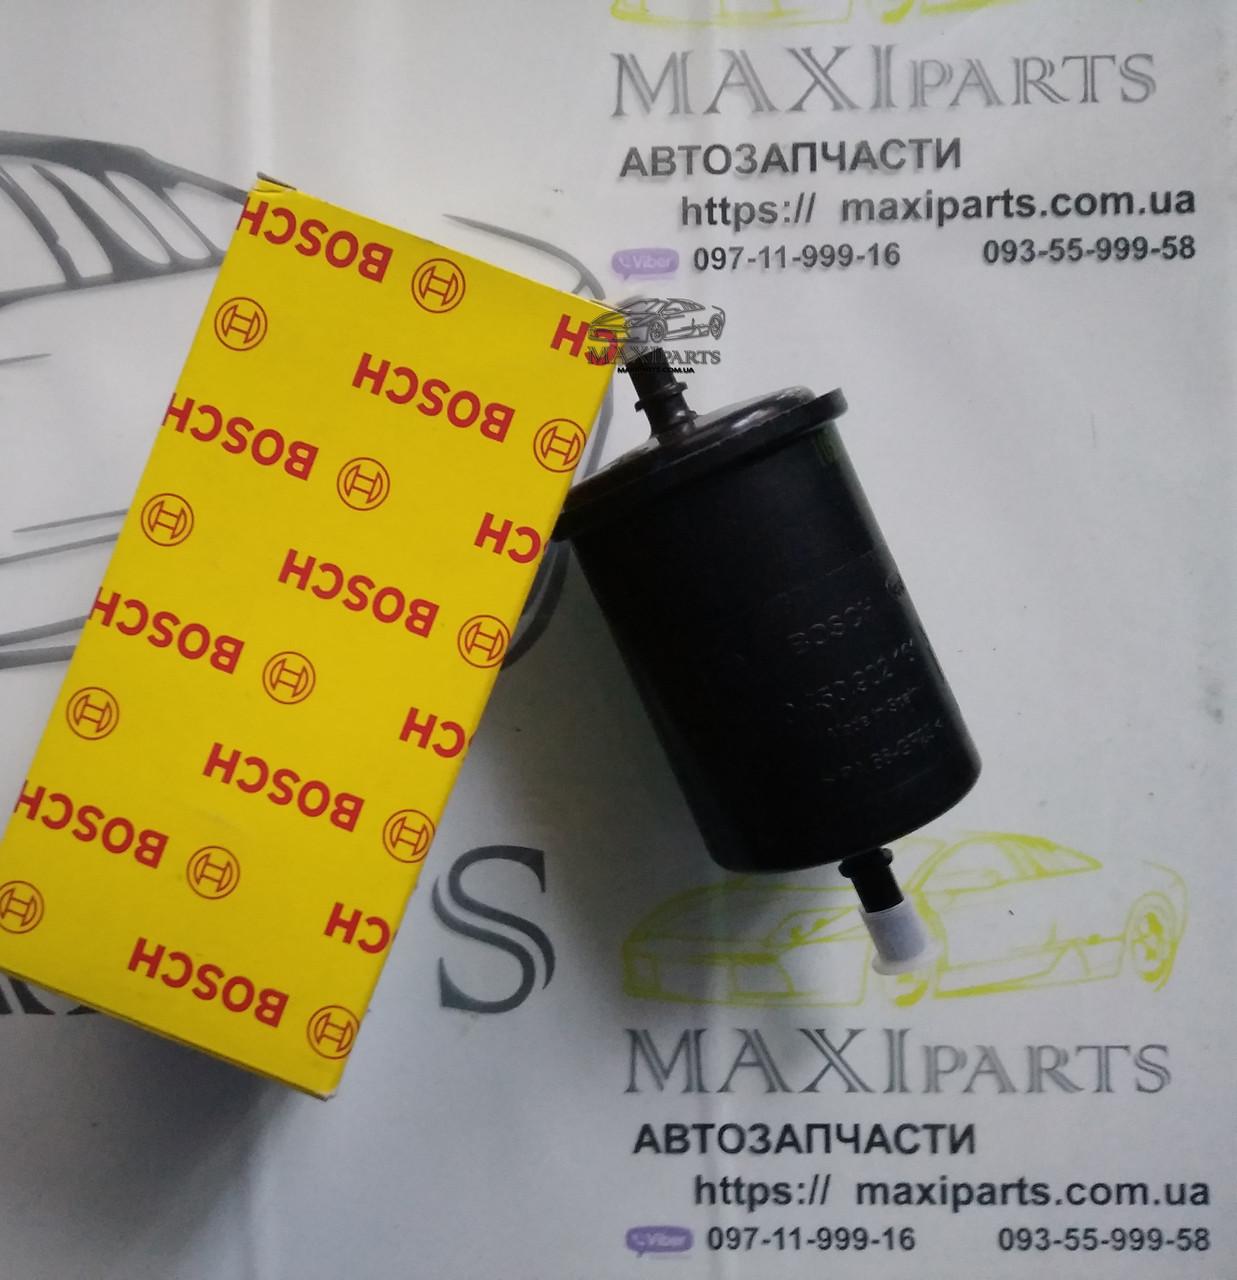 Фільтр паливний 1.2+ 1.2 16V + 1.4 + 1.6 16V / 1.2 Tce + 1.6 + 1.6 16V / 2.0 Renault Kangoo + Nissan Kubis